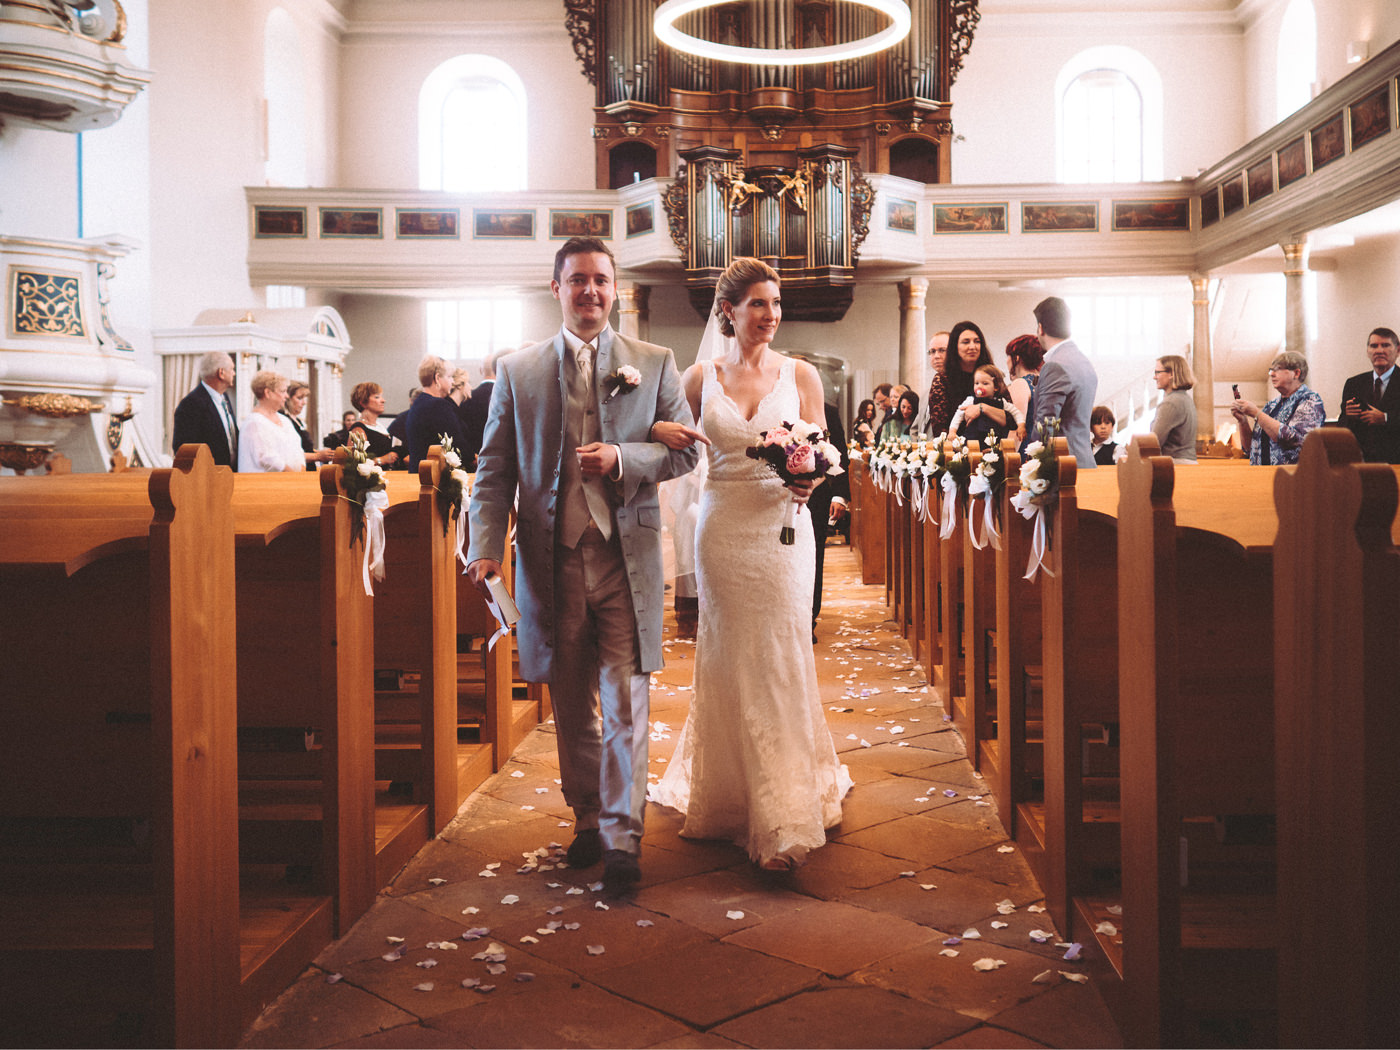 Heiraten grenzhof heidelberg